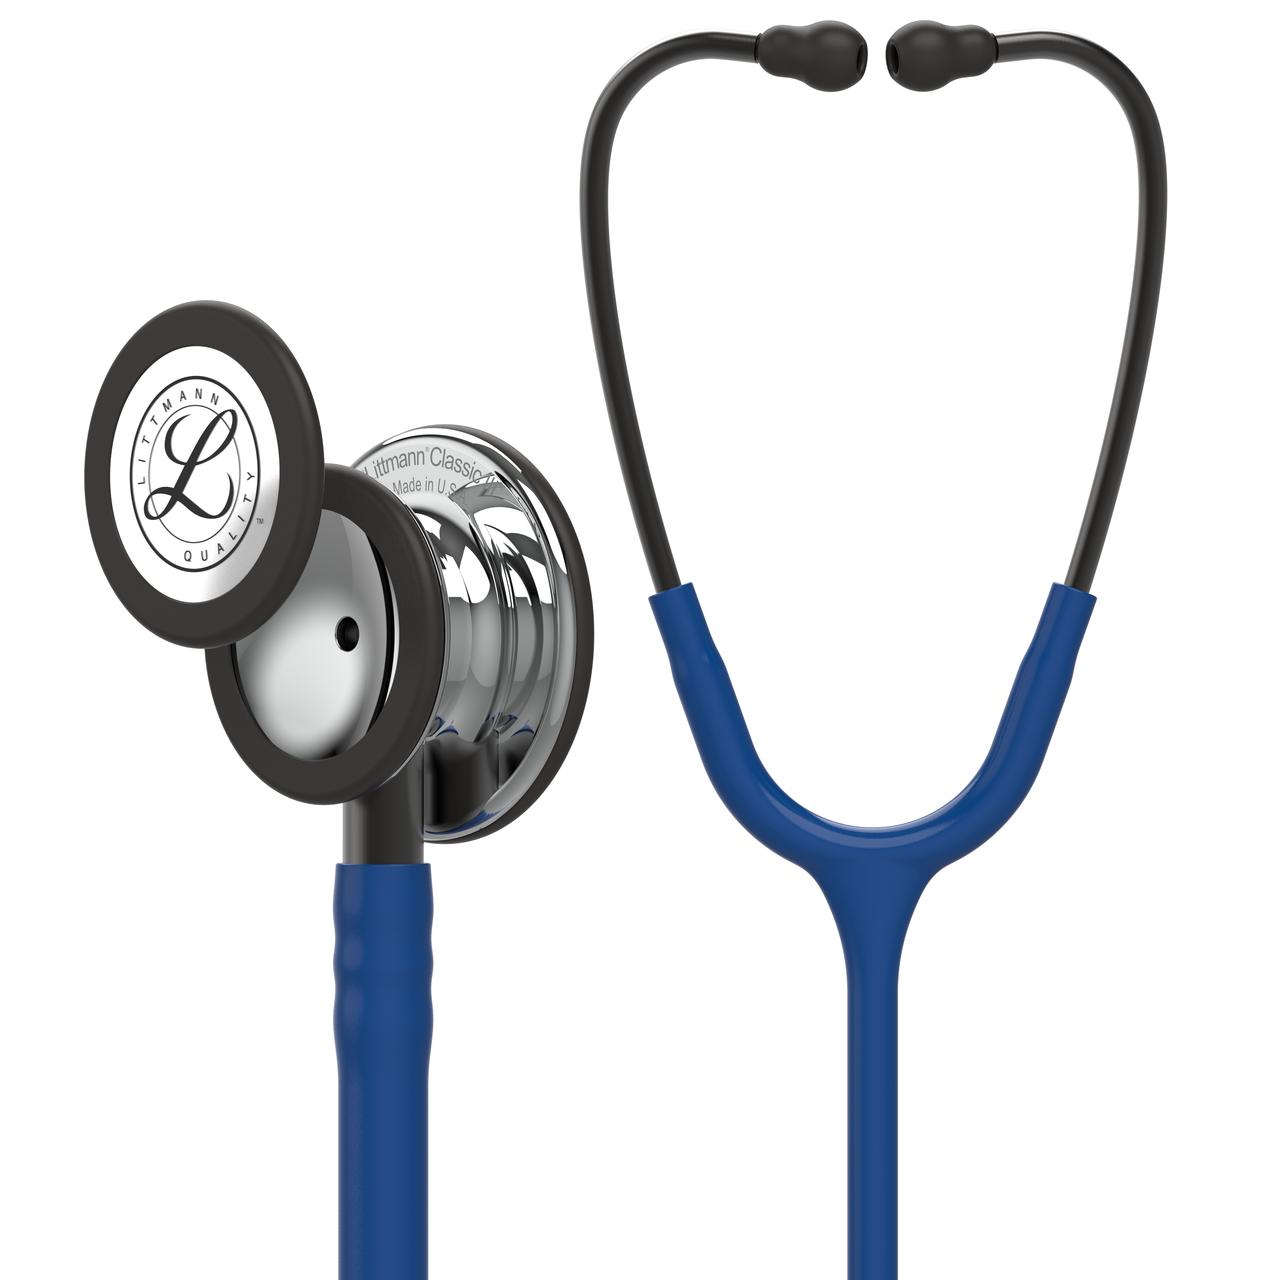 Littmann Classic III Stethoscope, Mirror Navy, 5863